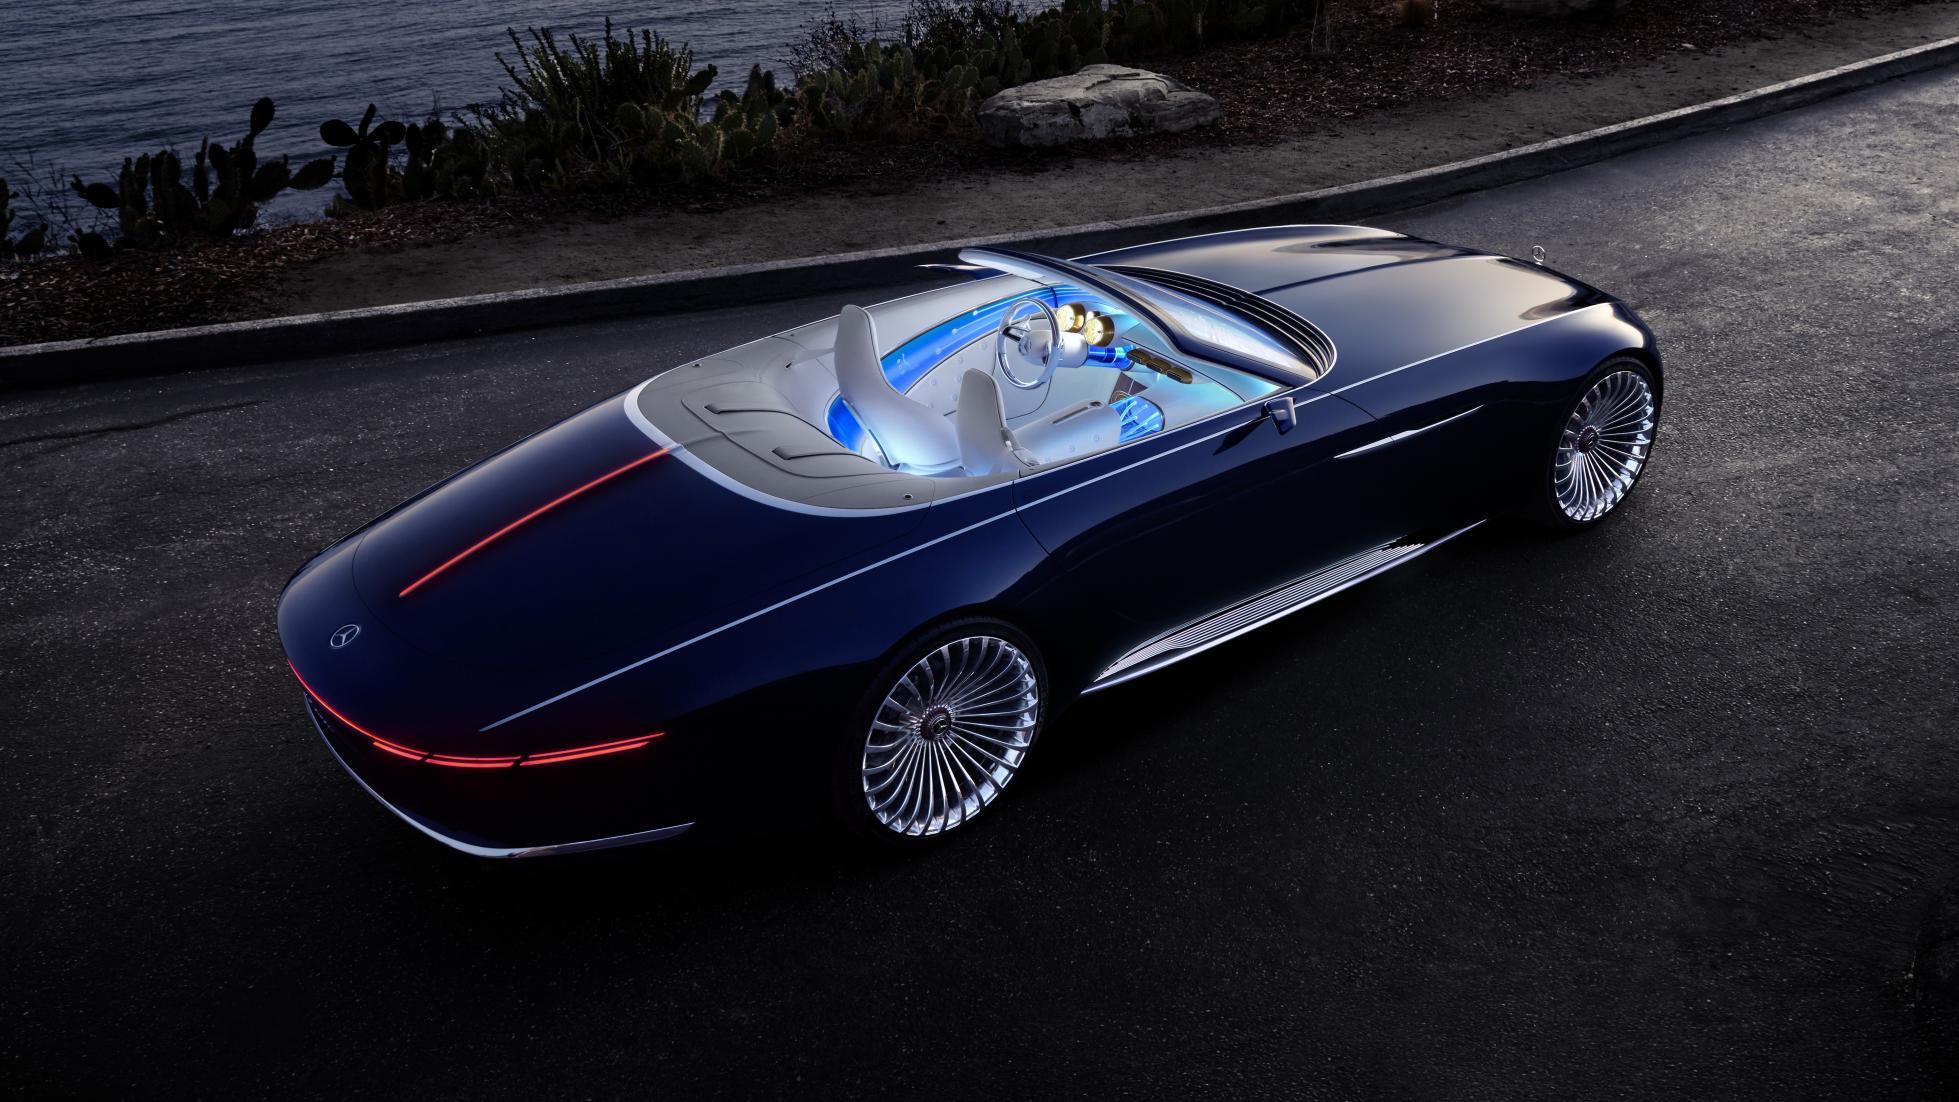 Vision Mercedes-Maybach 6 Cabriolet rear quarter